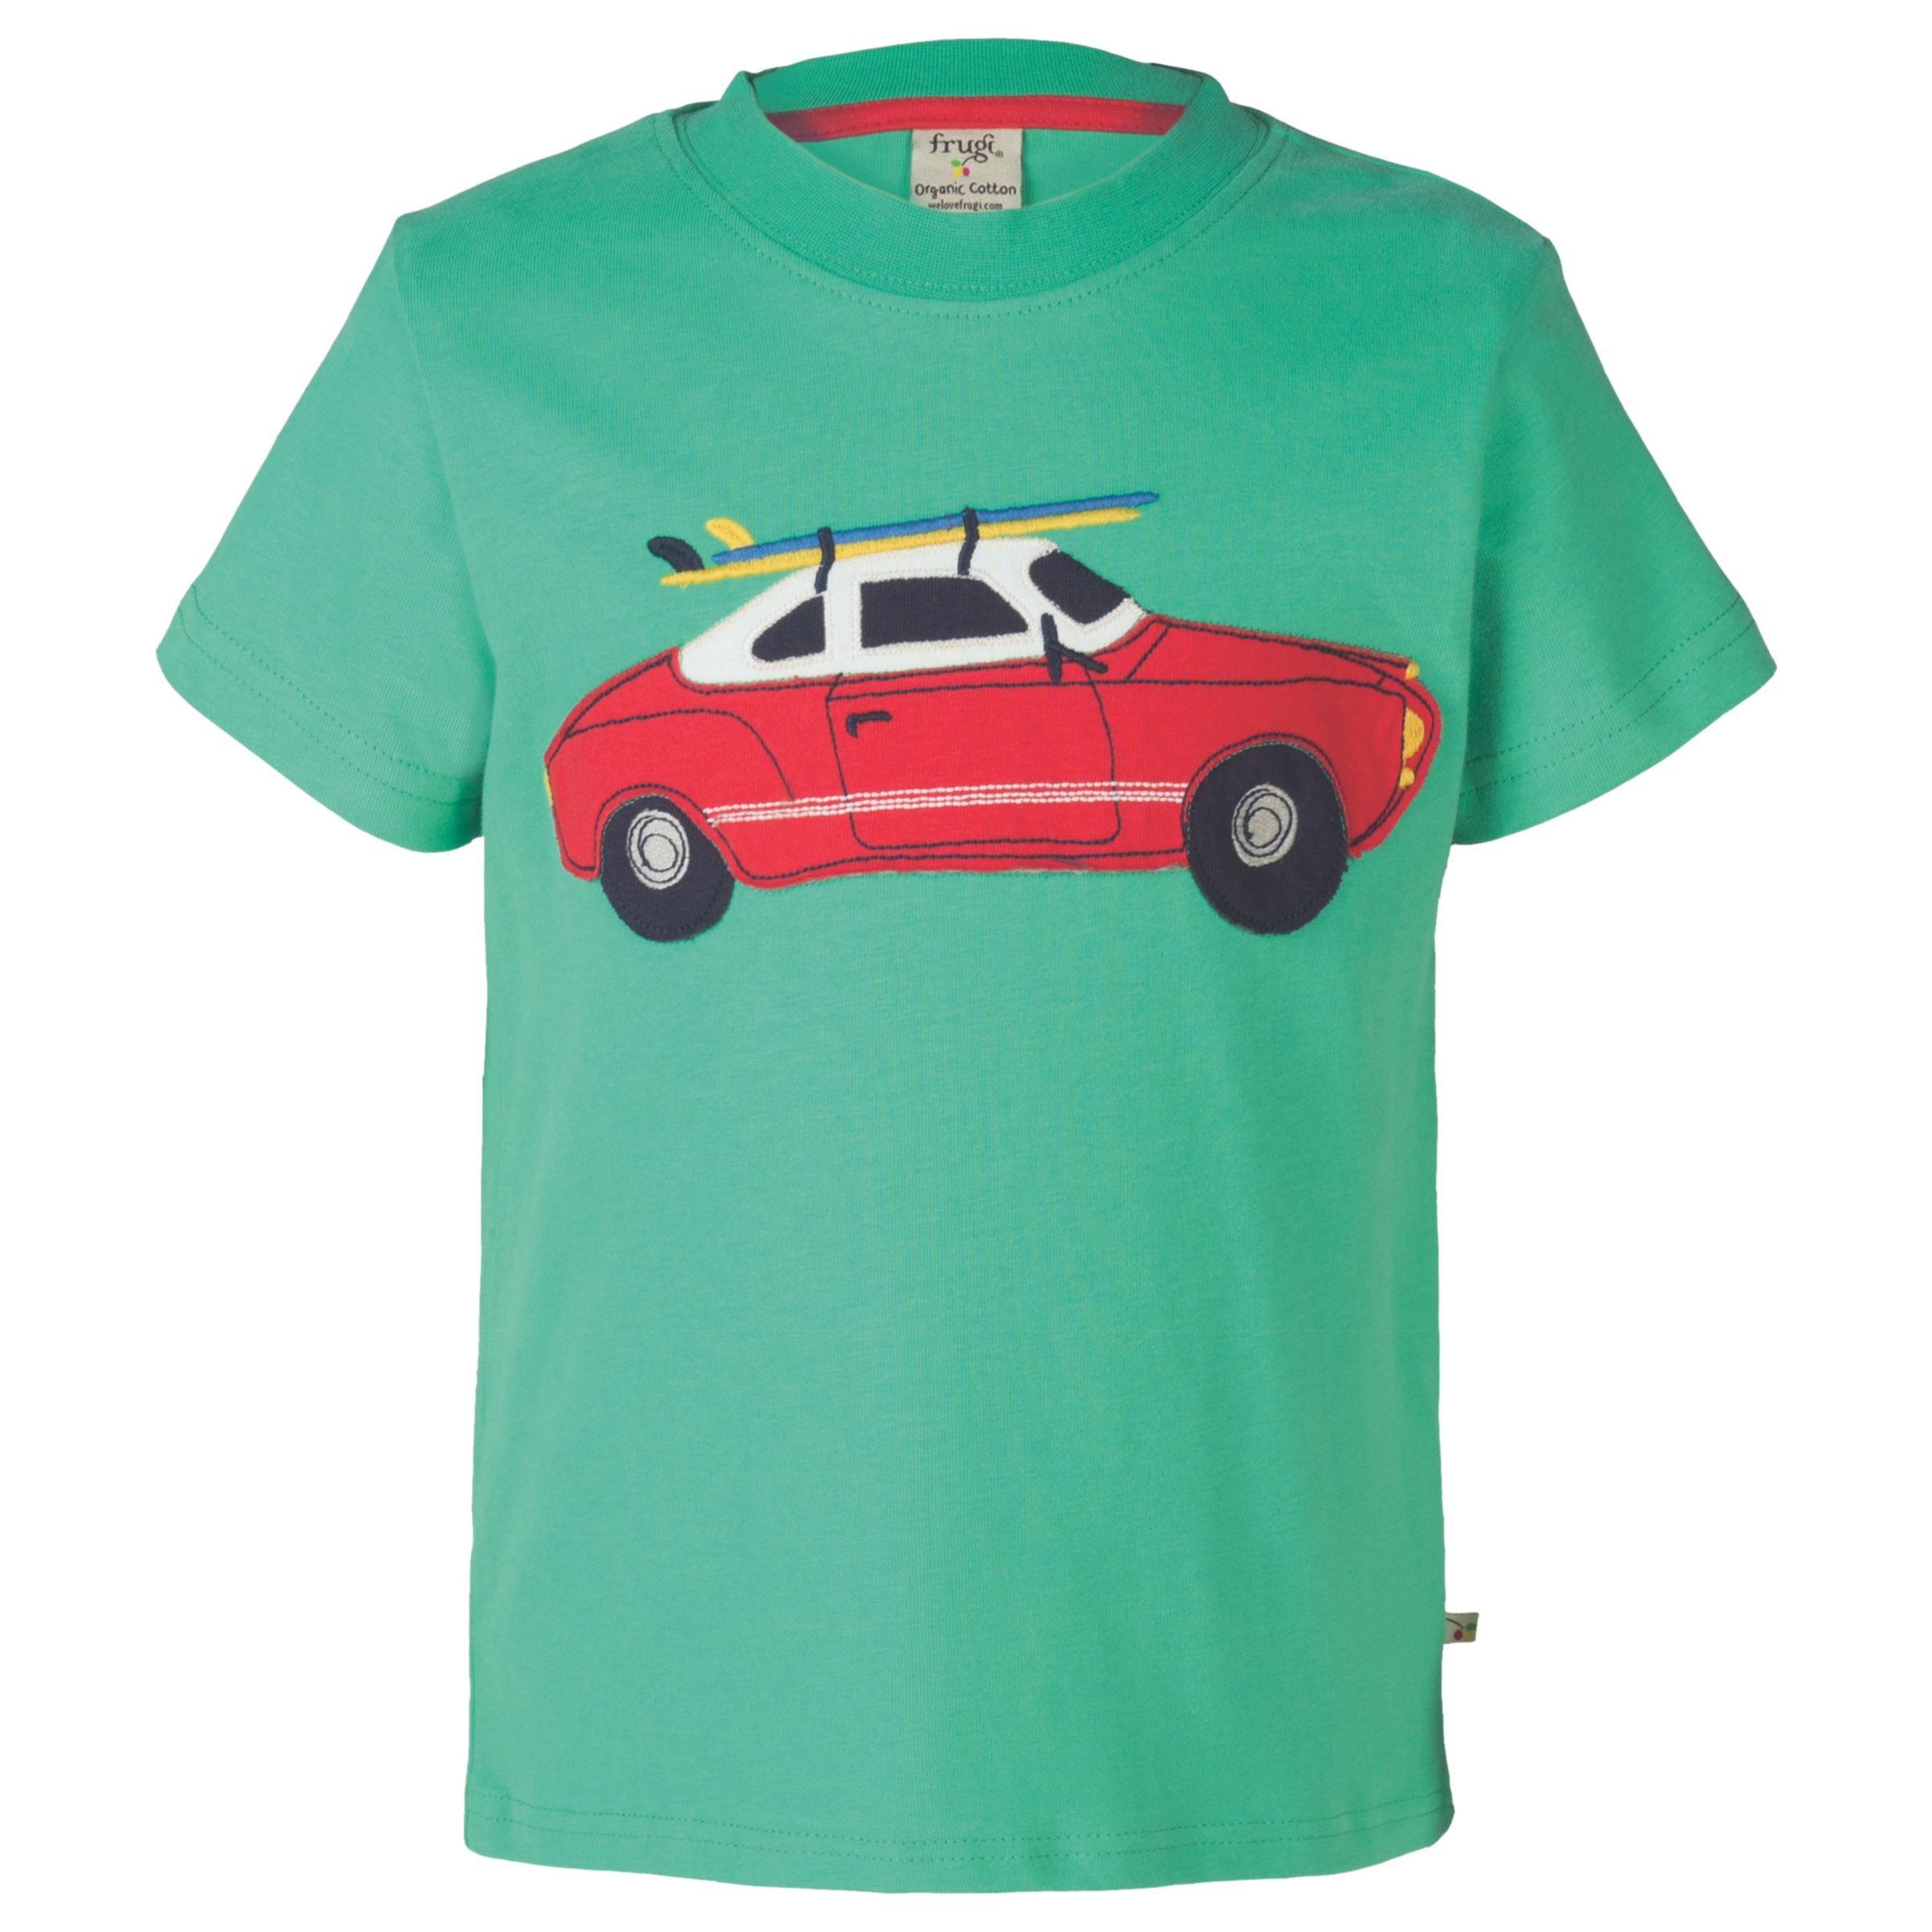 Frugi Organic Frugi Organic Boys' Stanley Car T-Shirt, Green